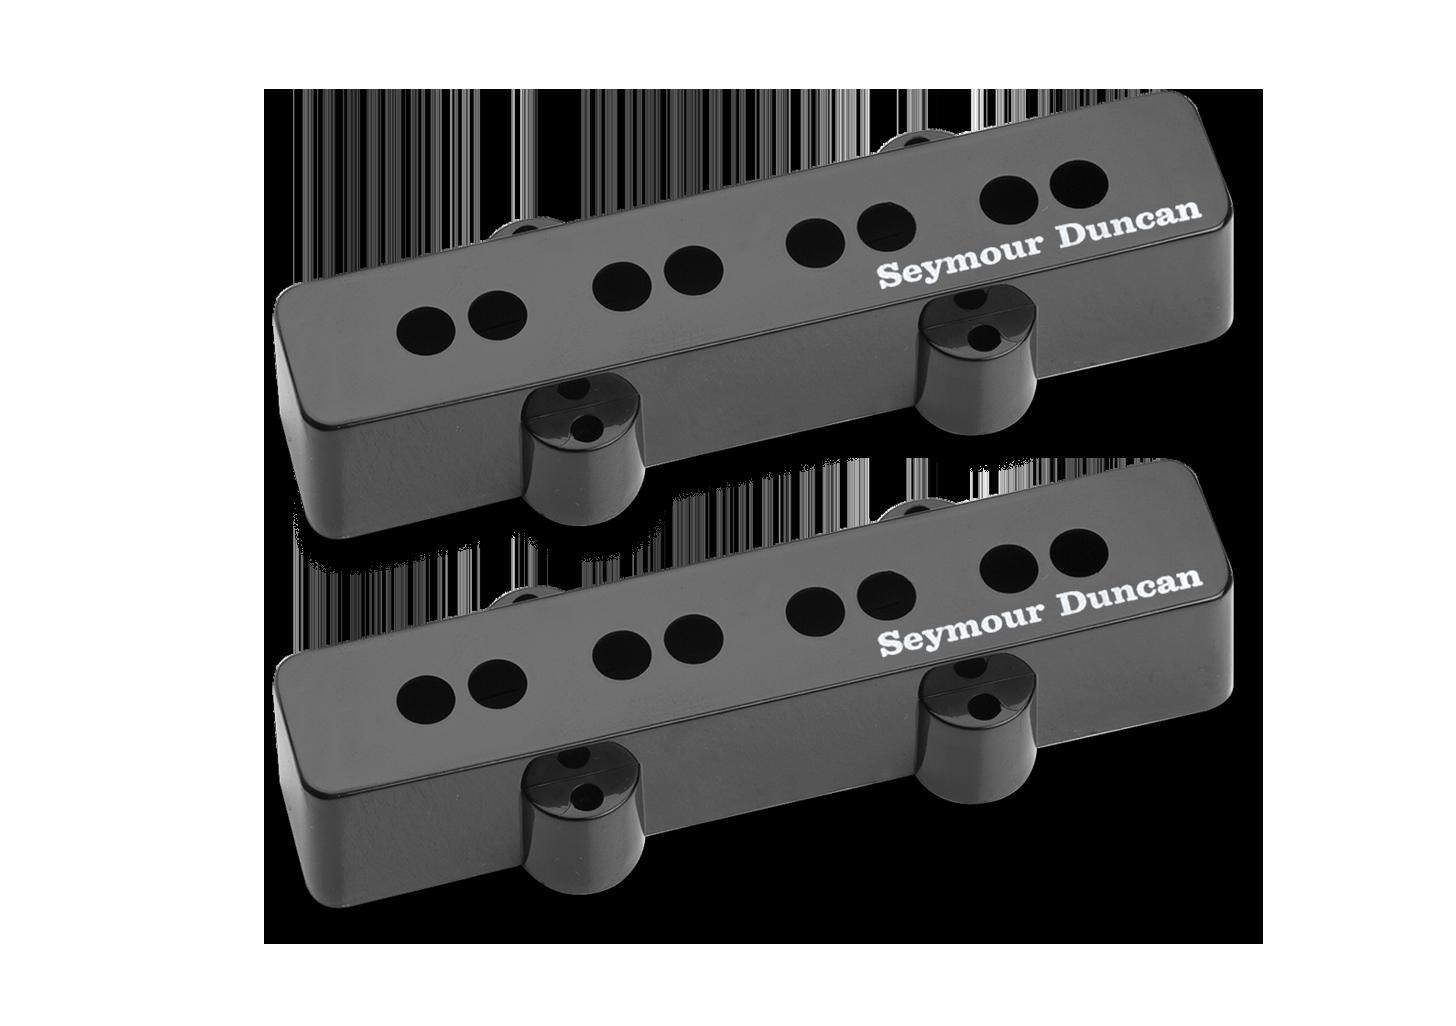 Seymour Duncan Bass Pickup Covers